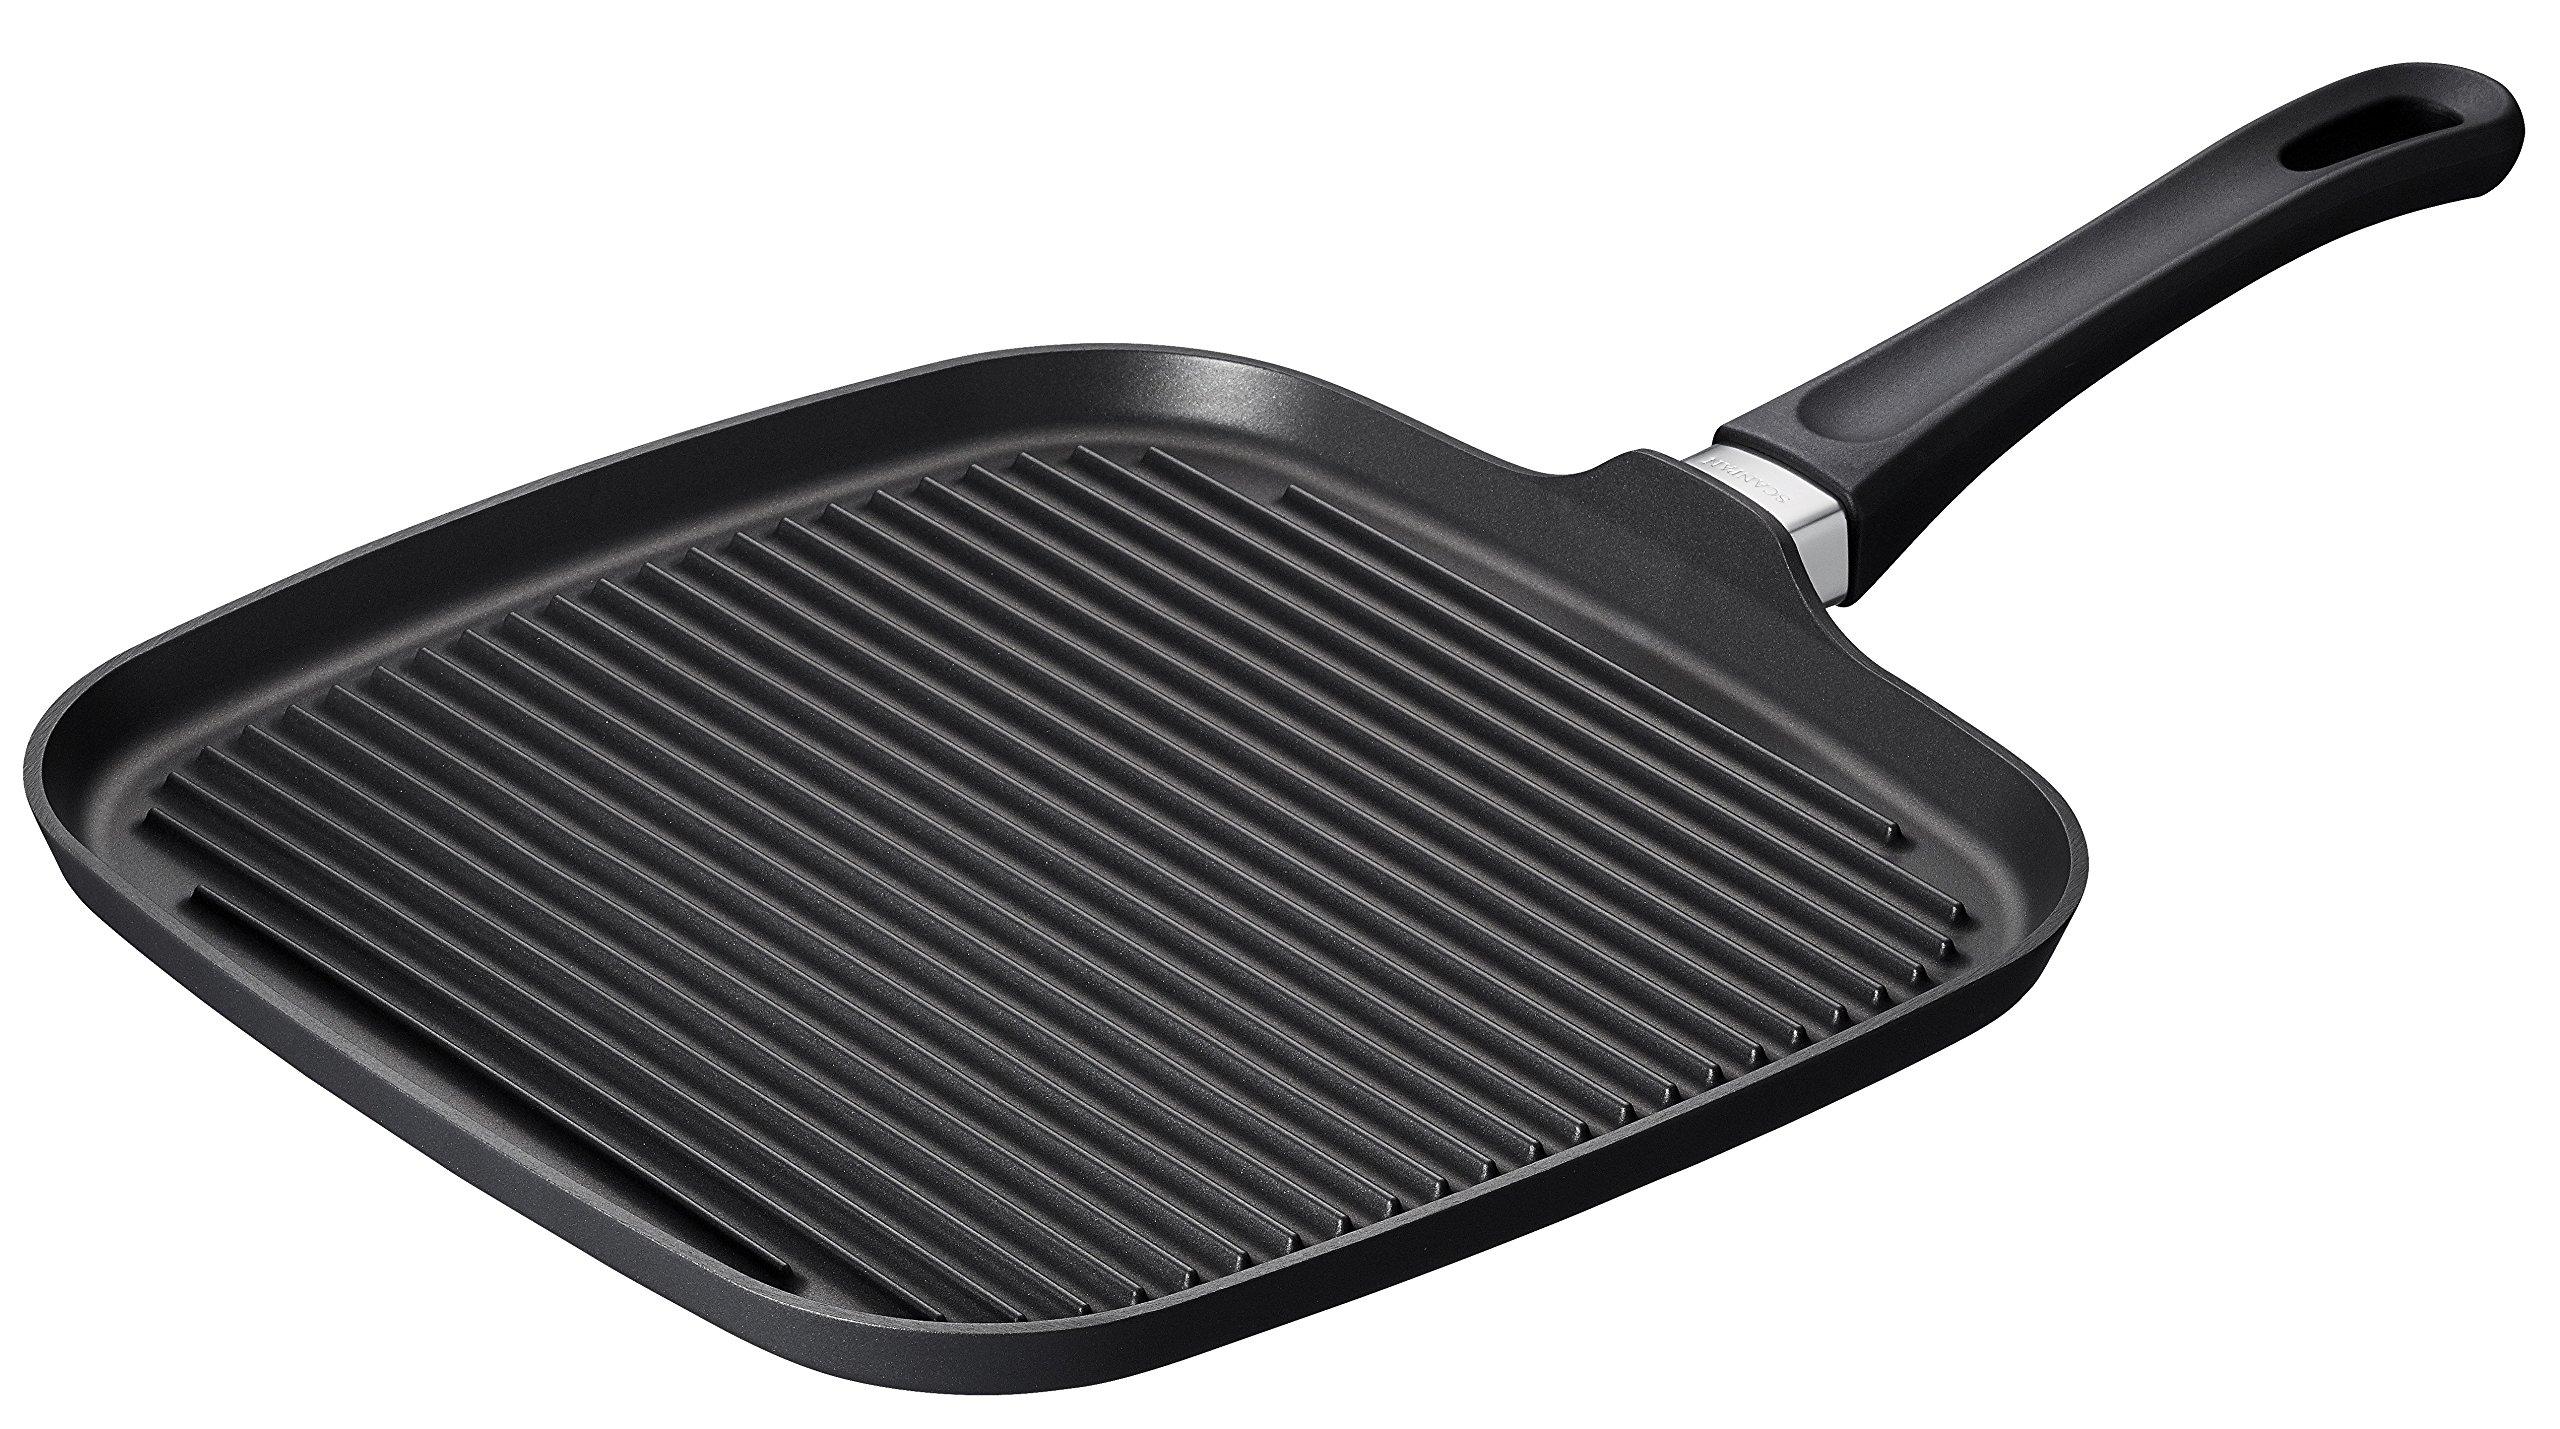 Scanpan Classic 10-1/2-Inch Square Grill Pan